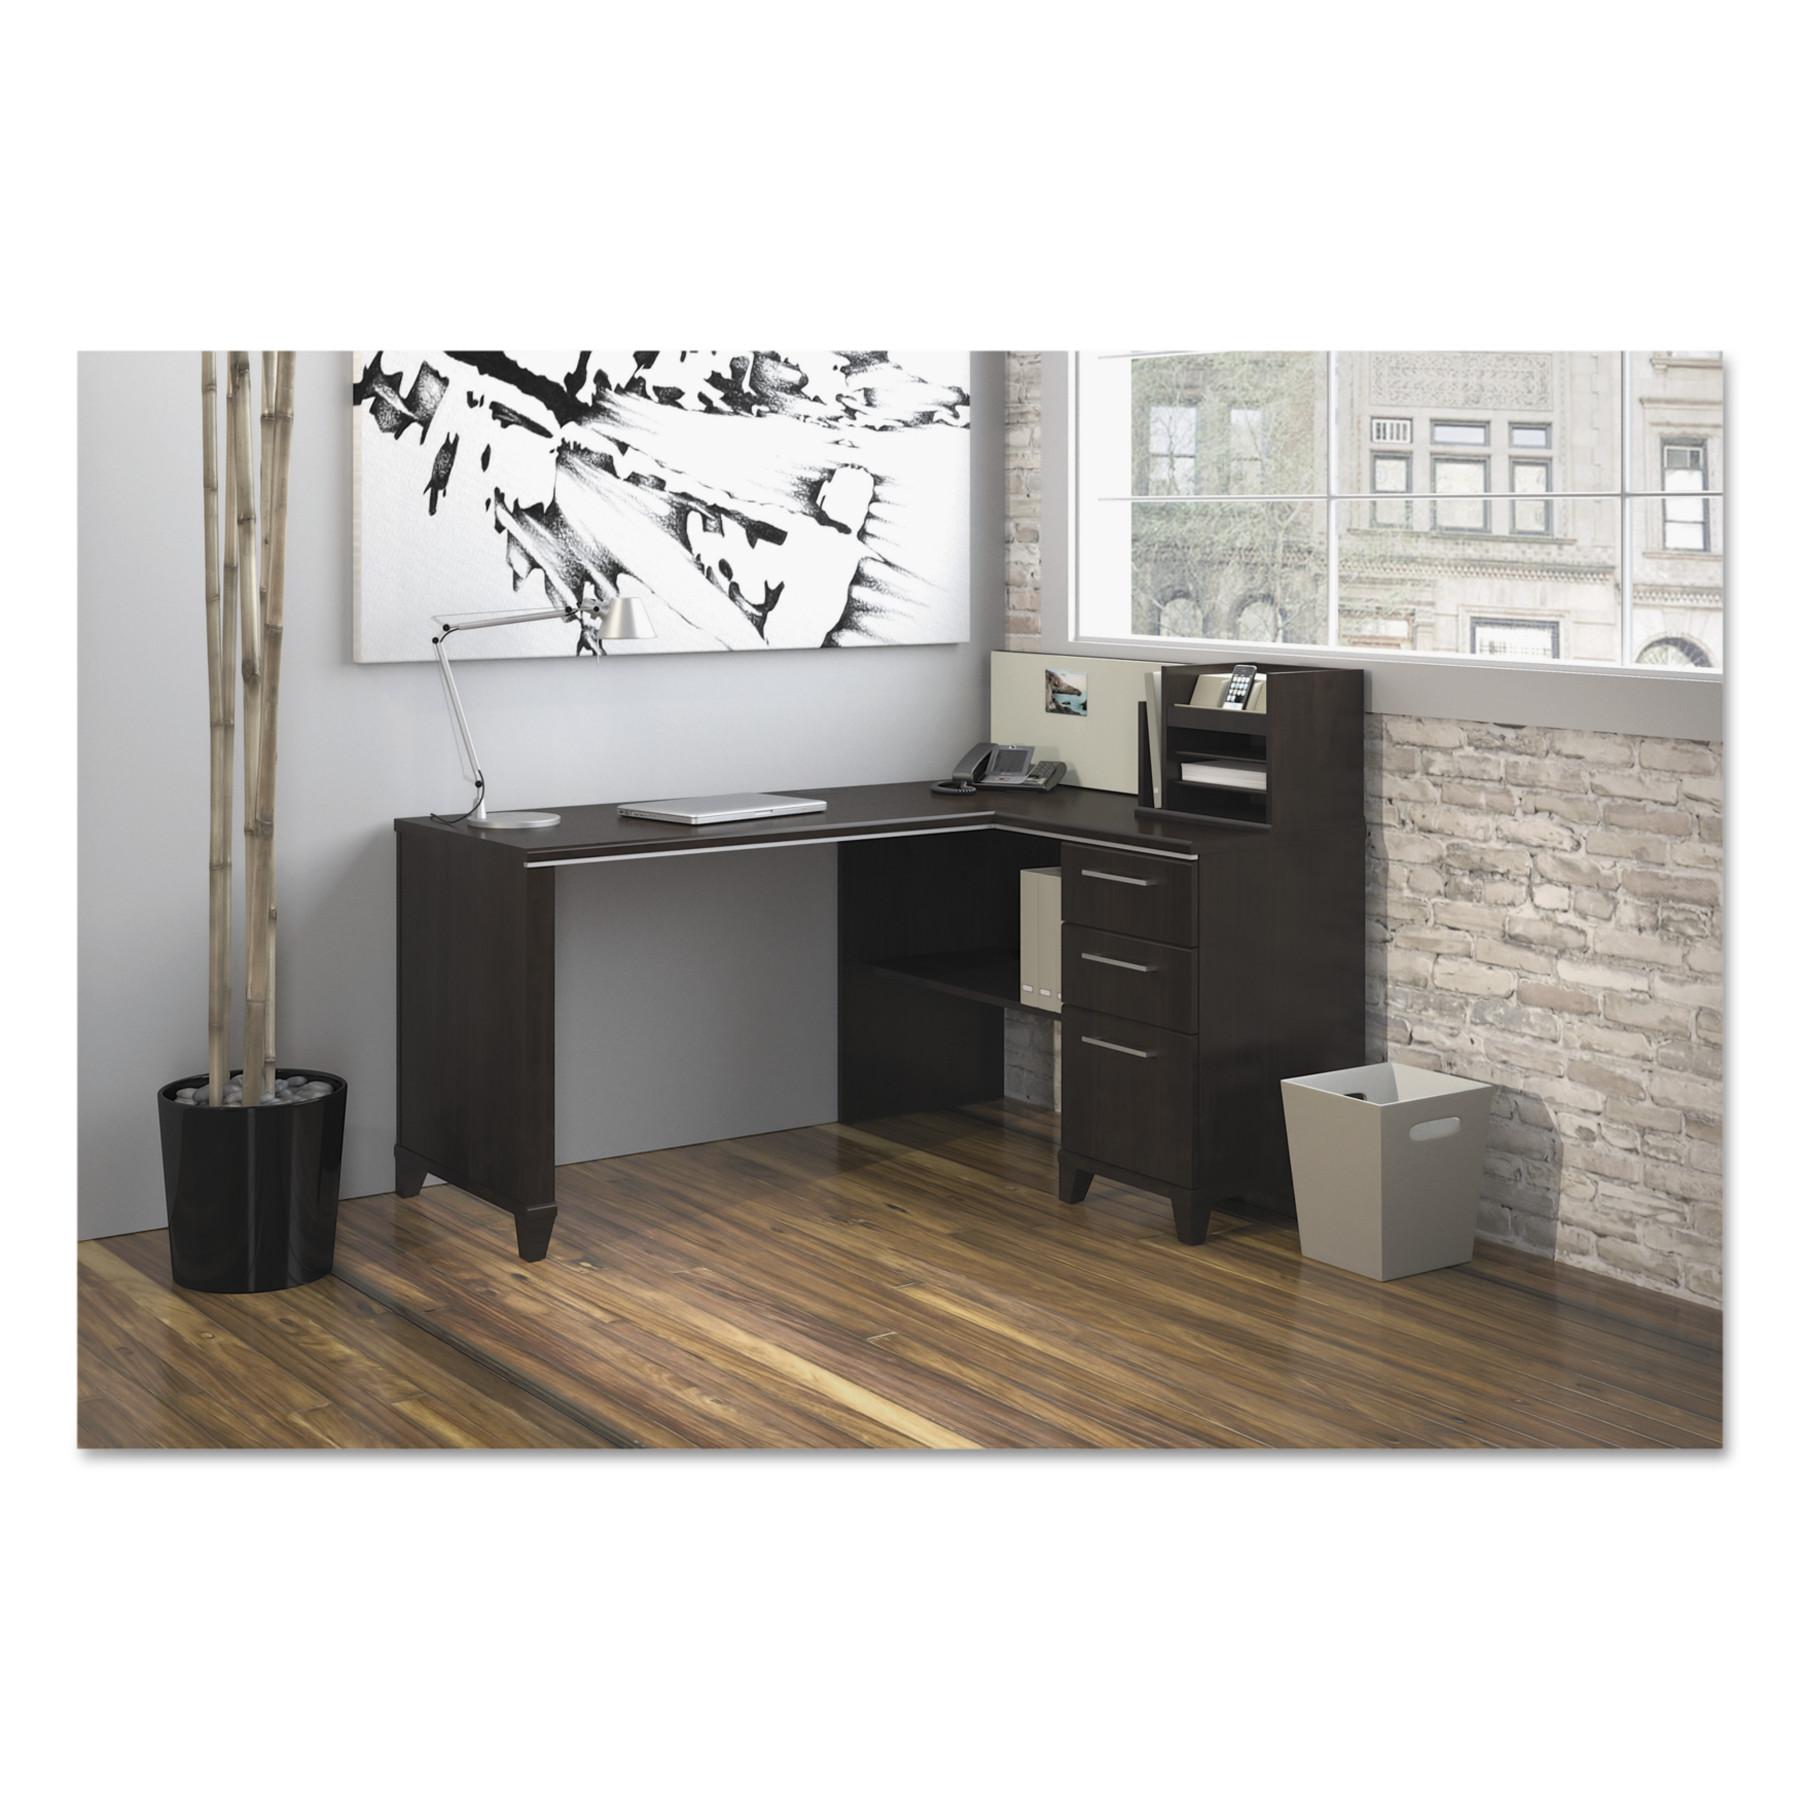 Enterprise Collection 60W x 47D Corner Desk, Mocha Cherry (Box 2 of 2)